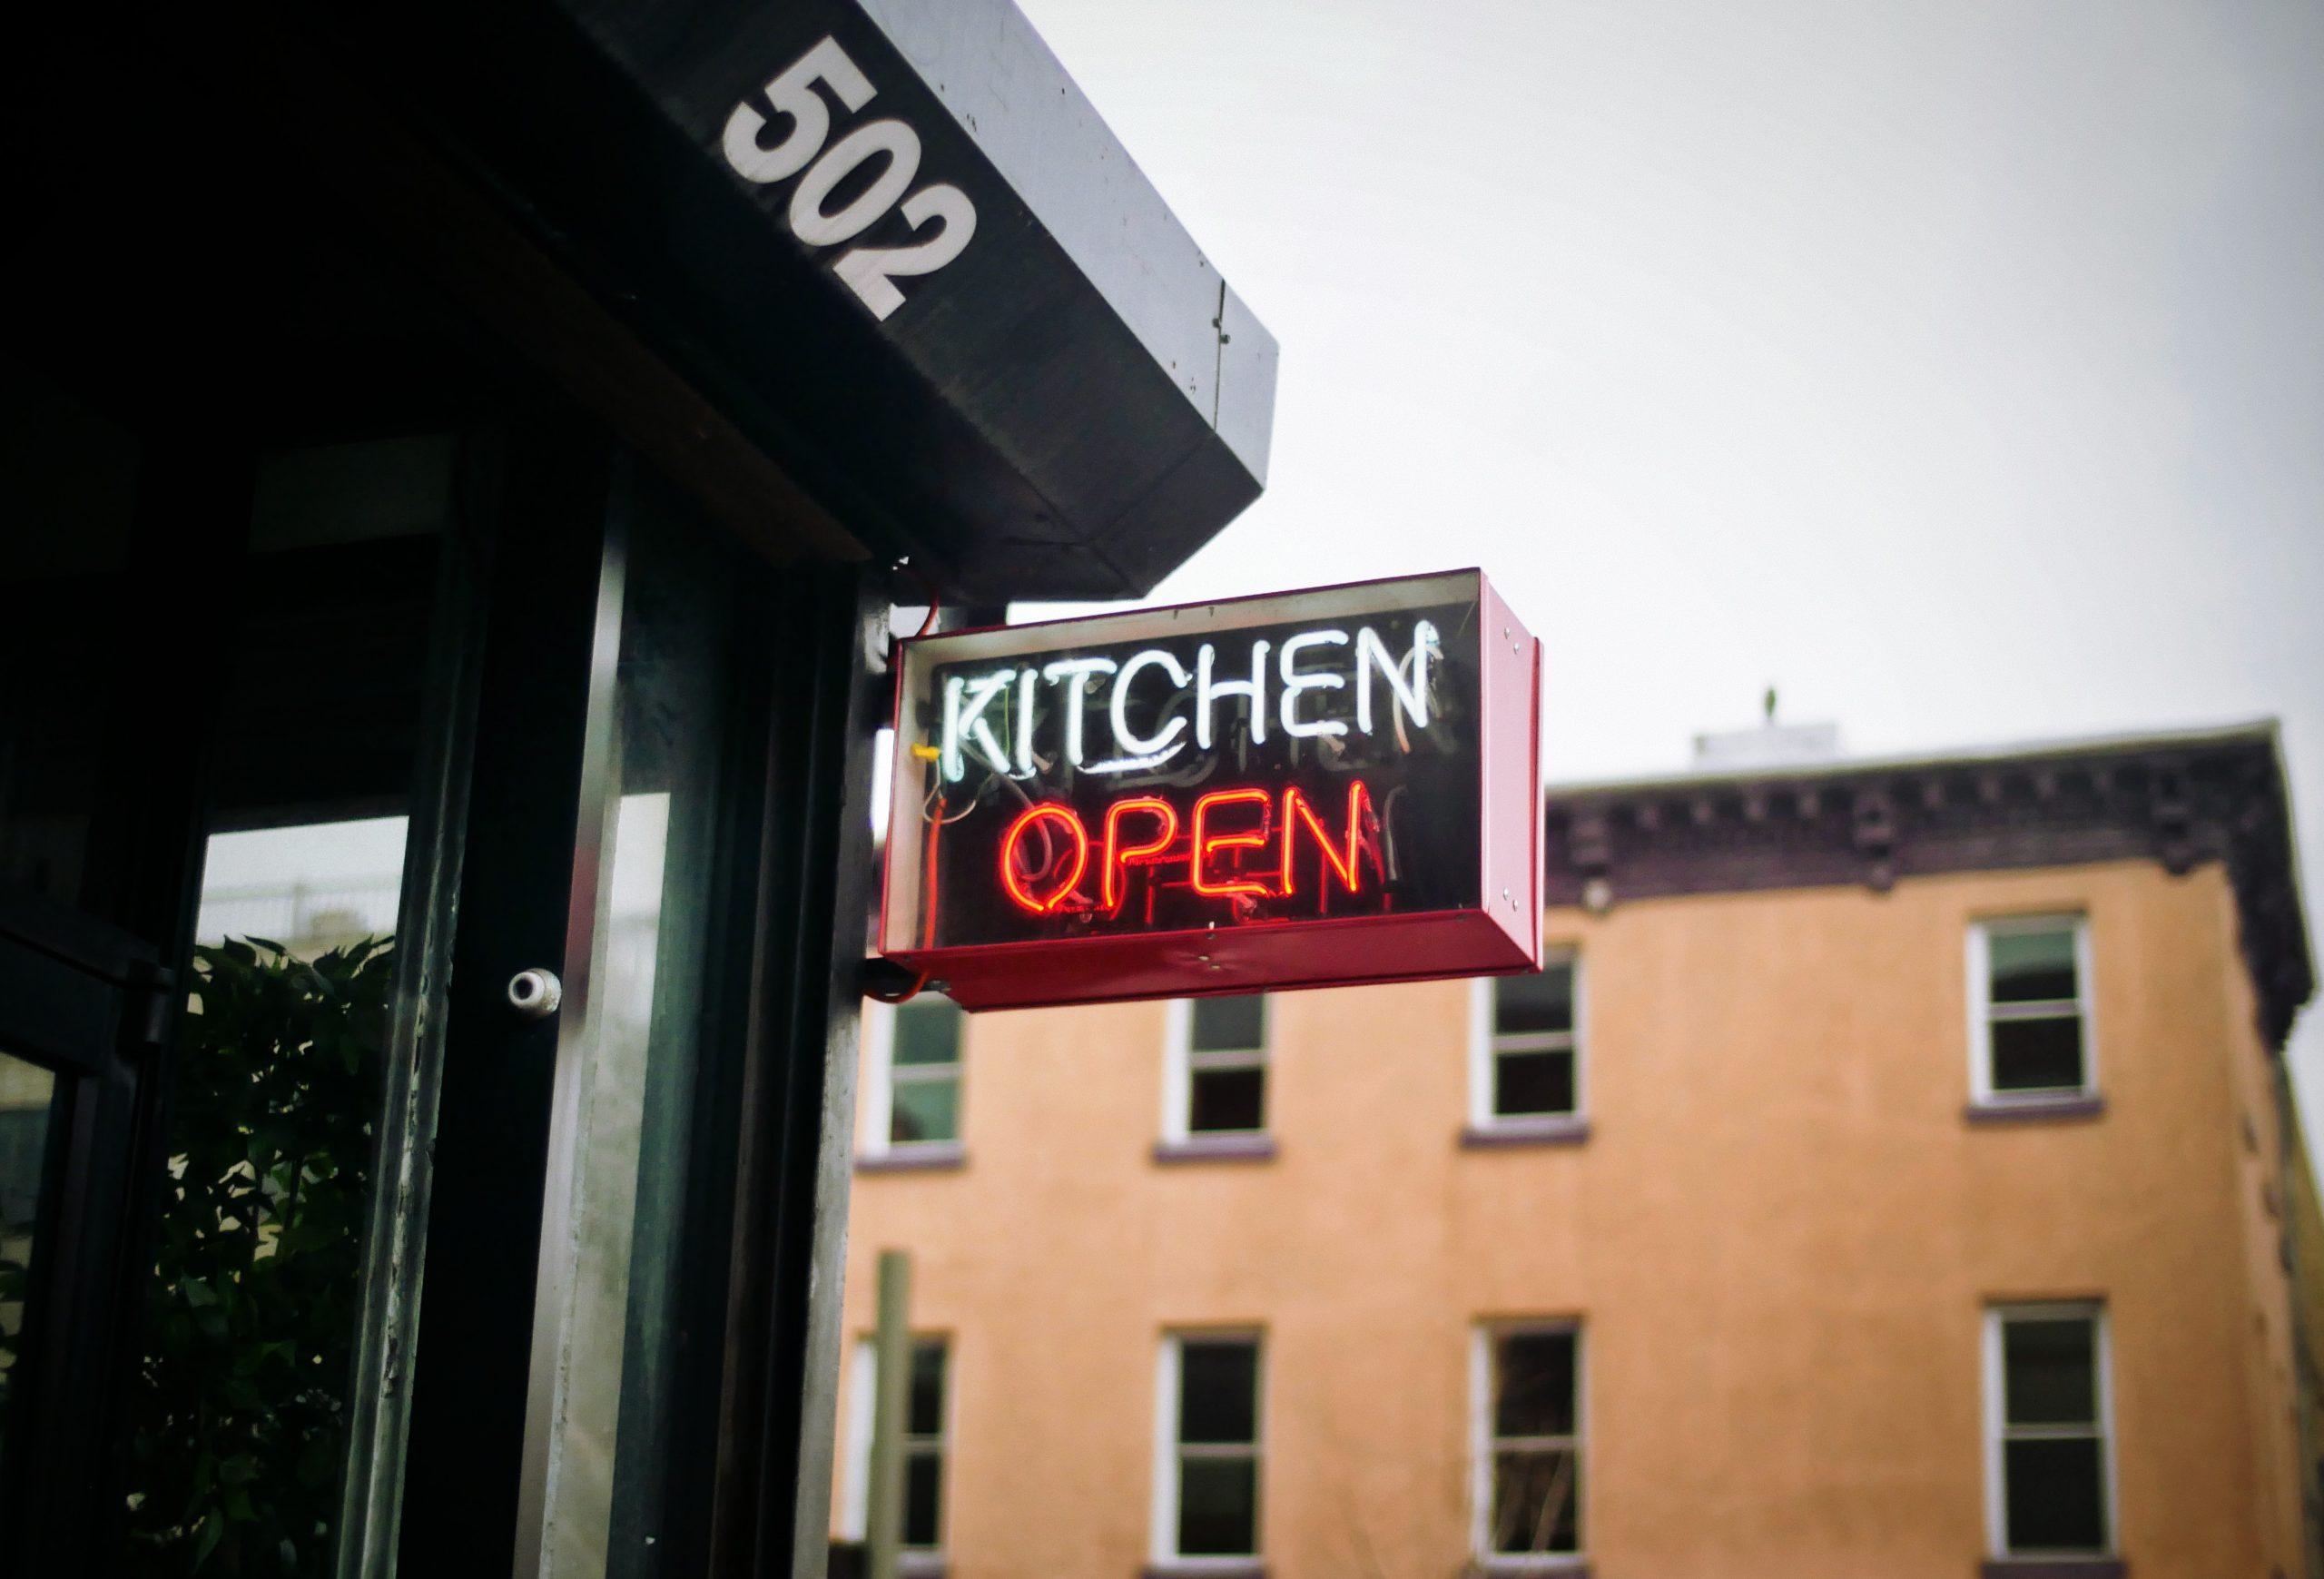 kitchen open image